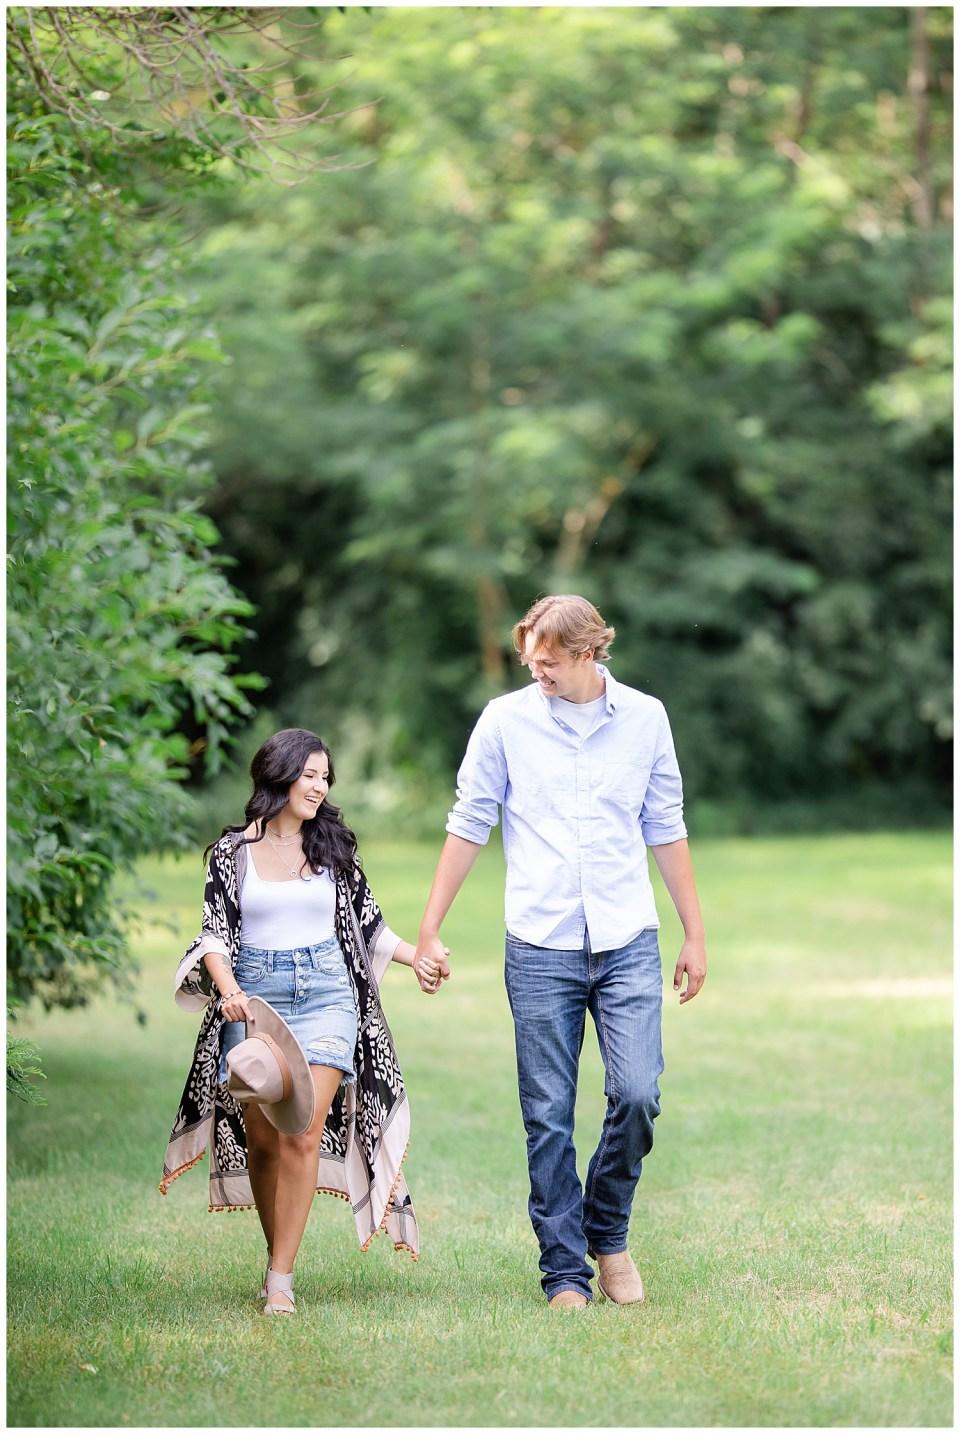 Couple walking together at Wall Lake, South Dakota during engagement session at sunset